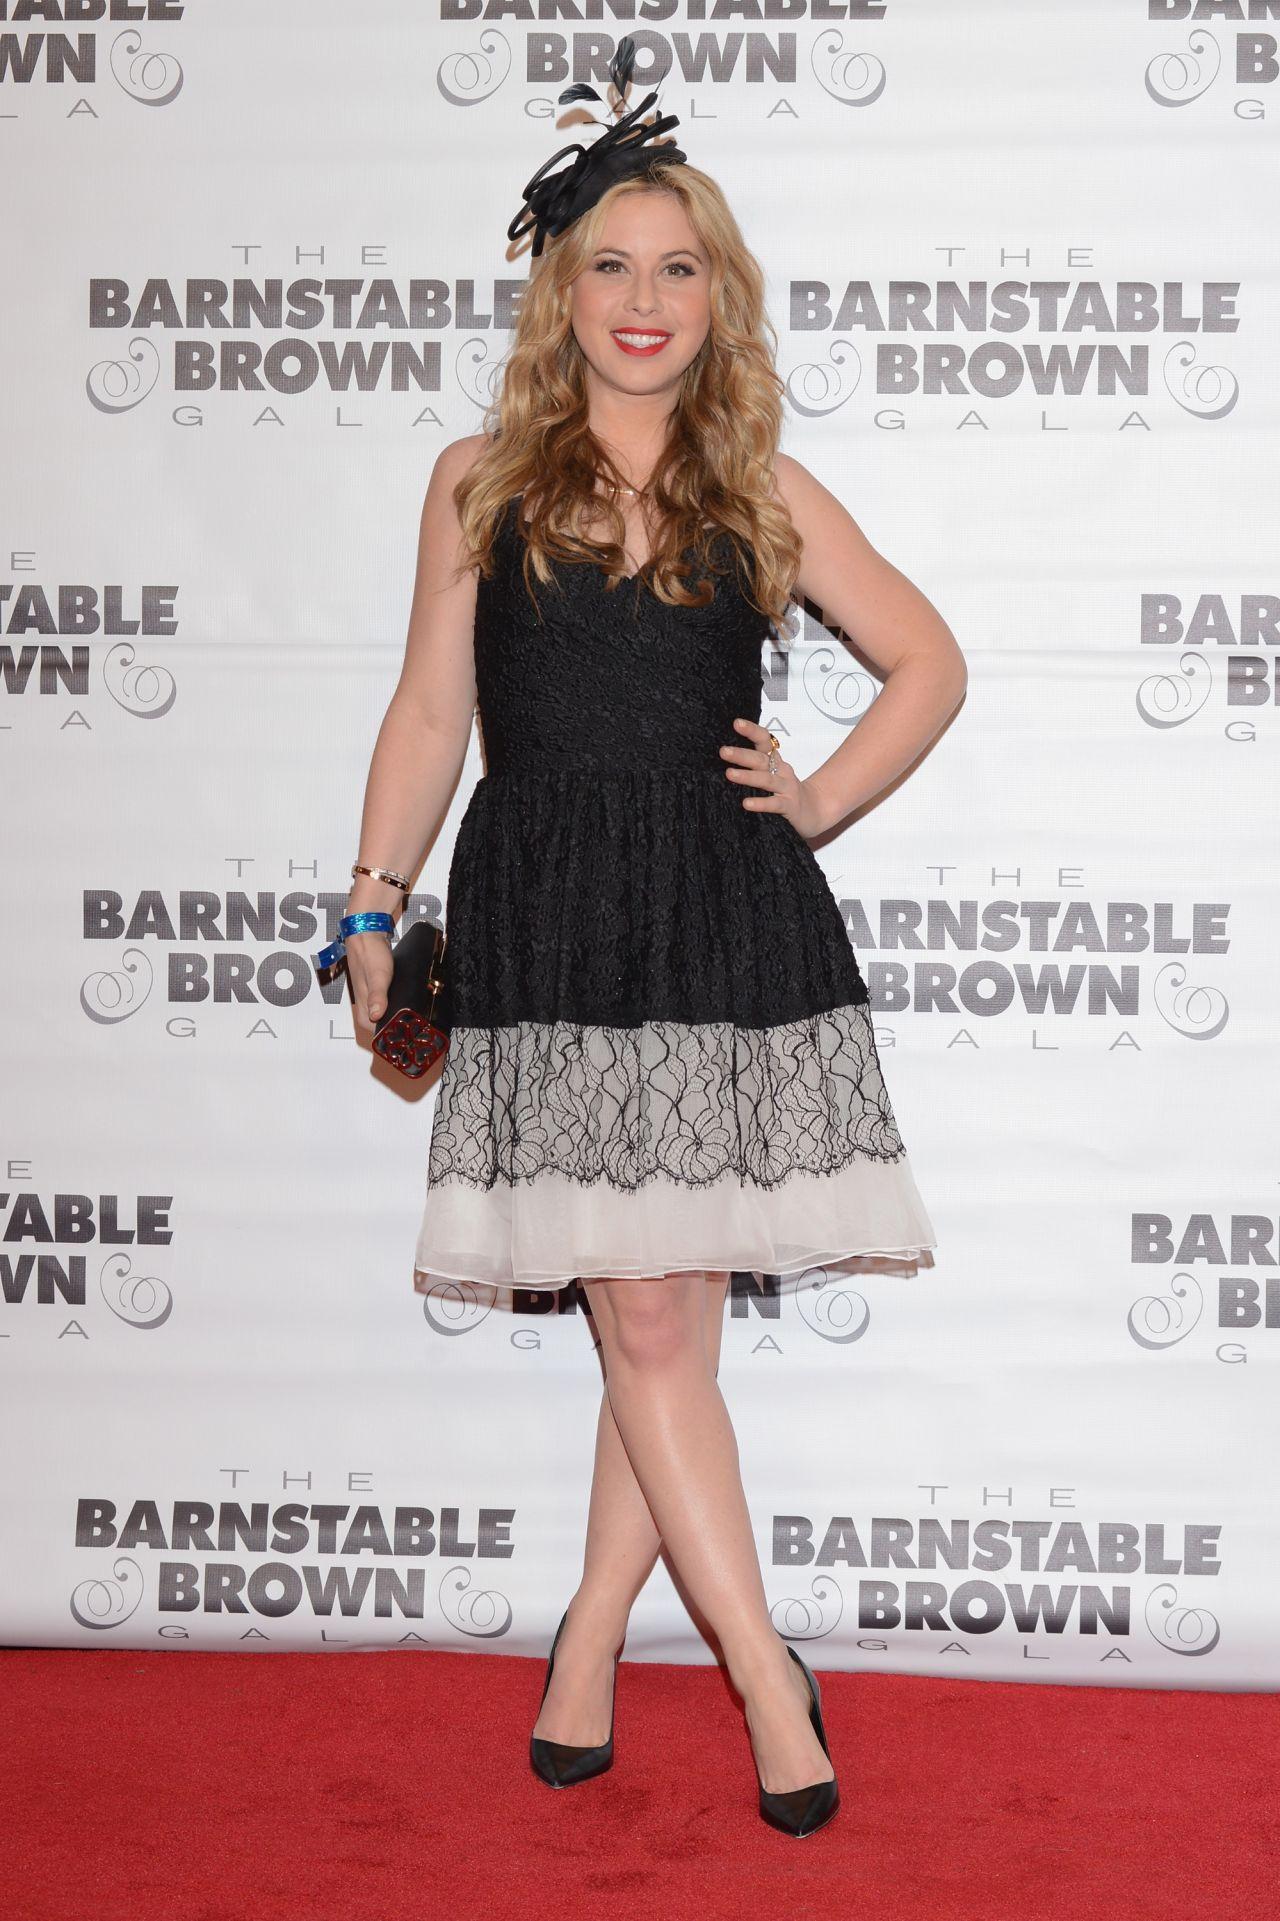 Tara Lipinski - The Barnstable Brown Kentucky Derby Eve Gala - May 2014